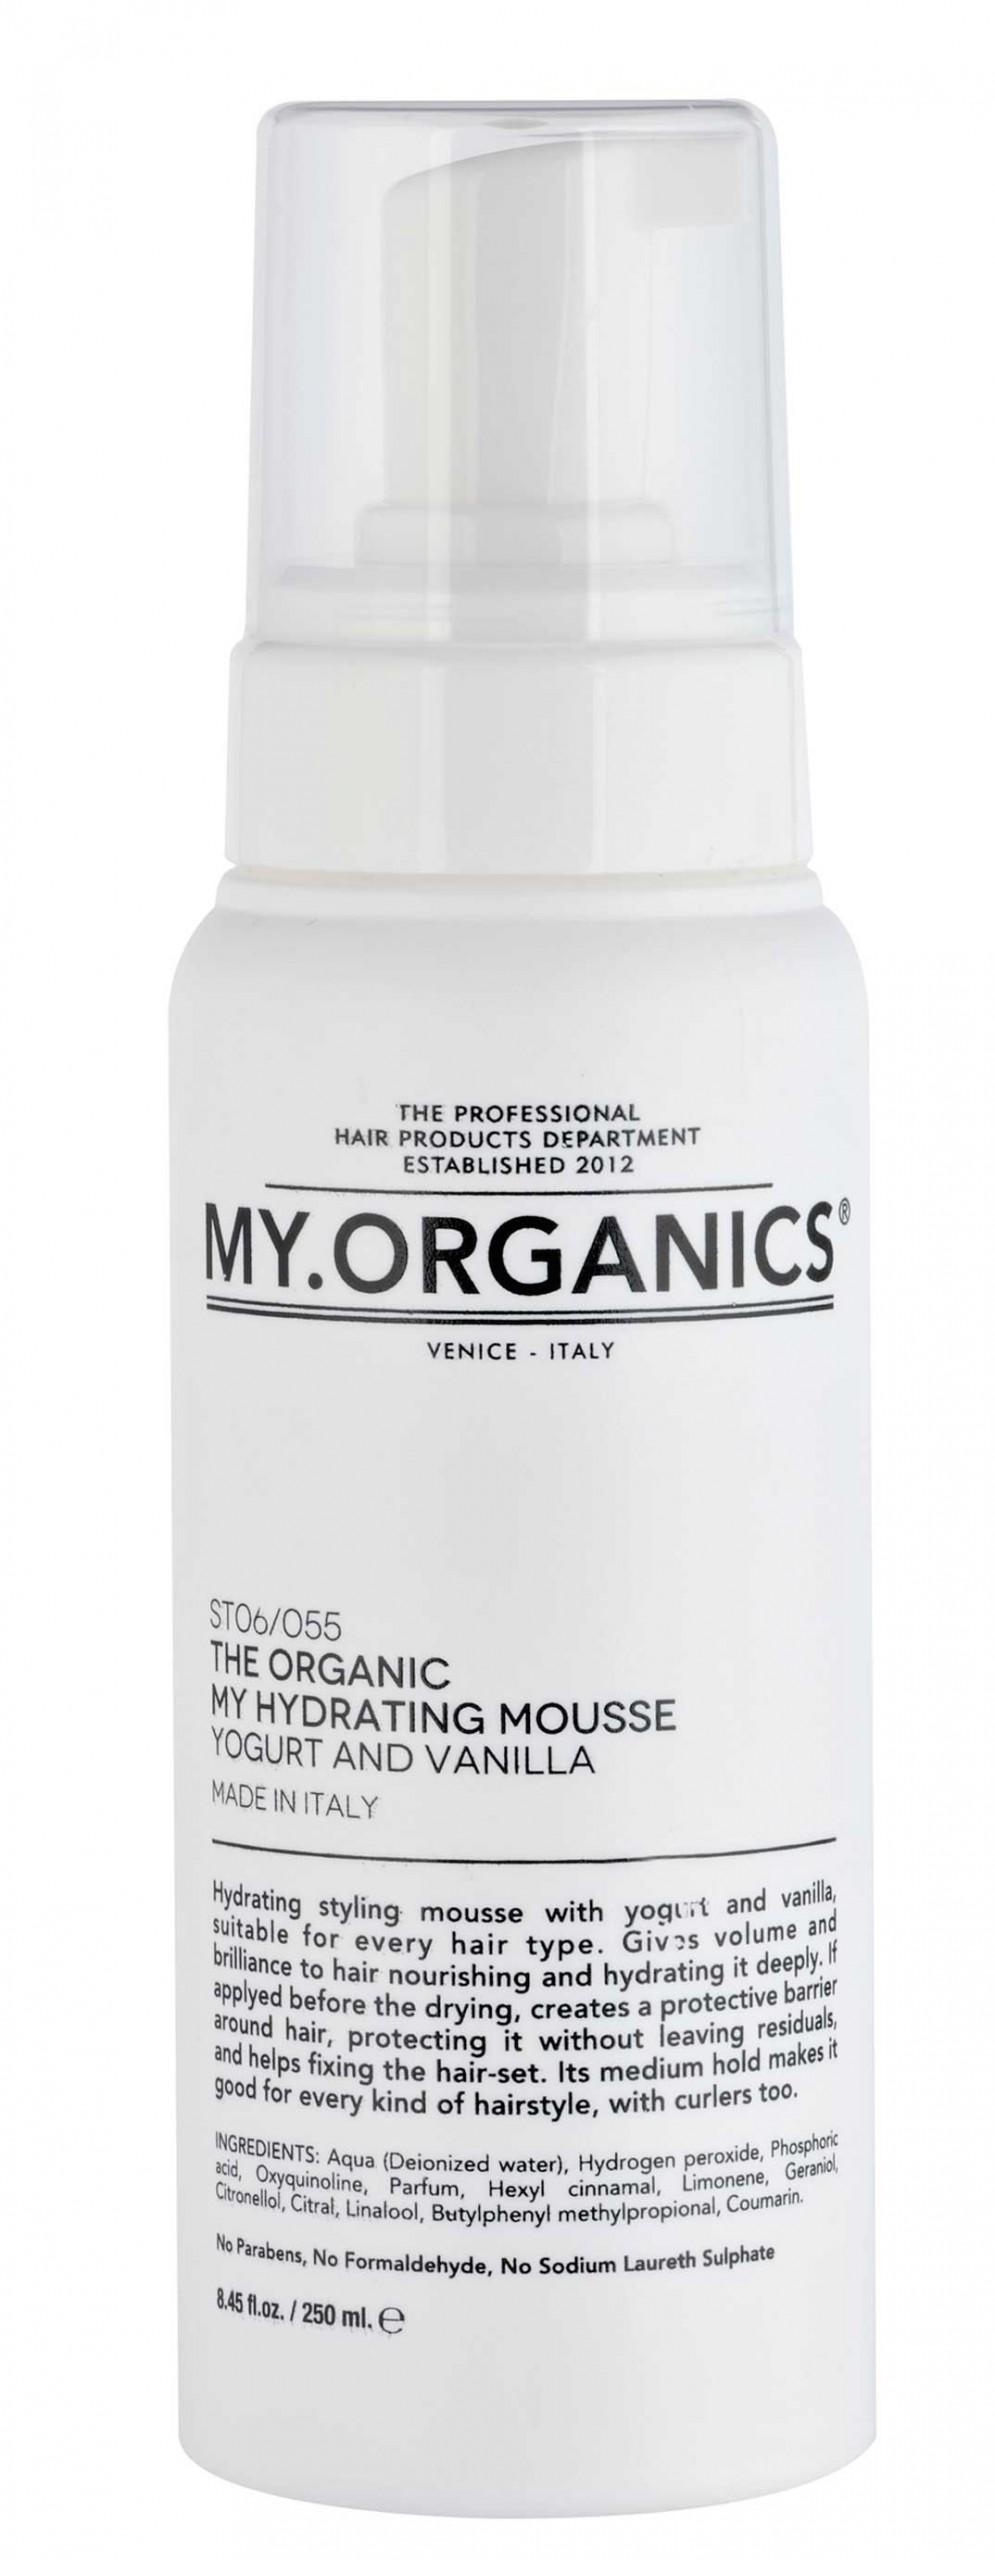 The-Organic-Hydrating-Mousse-Yogurt-and-Vainilla_AR